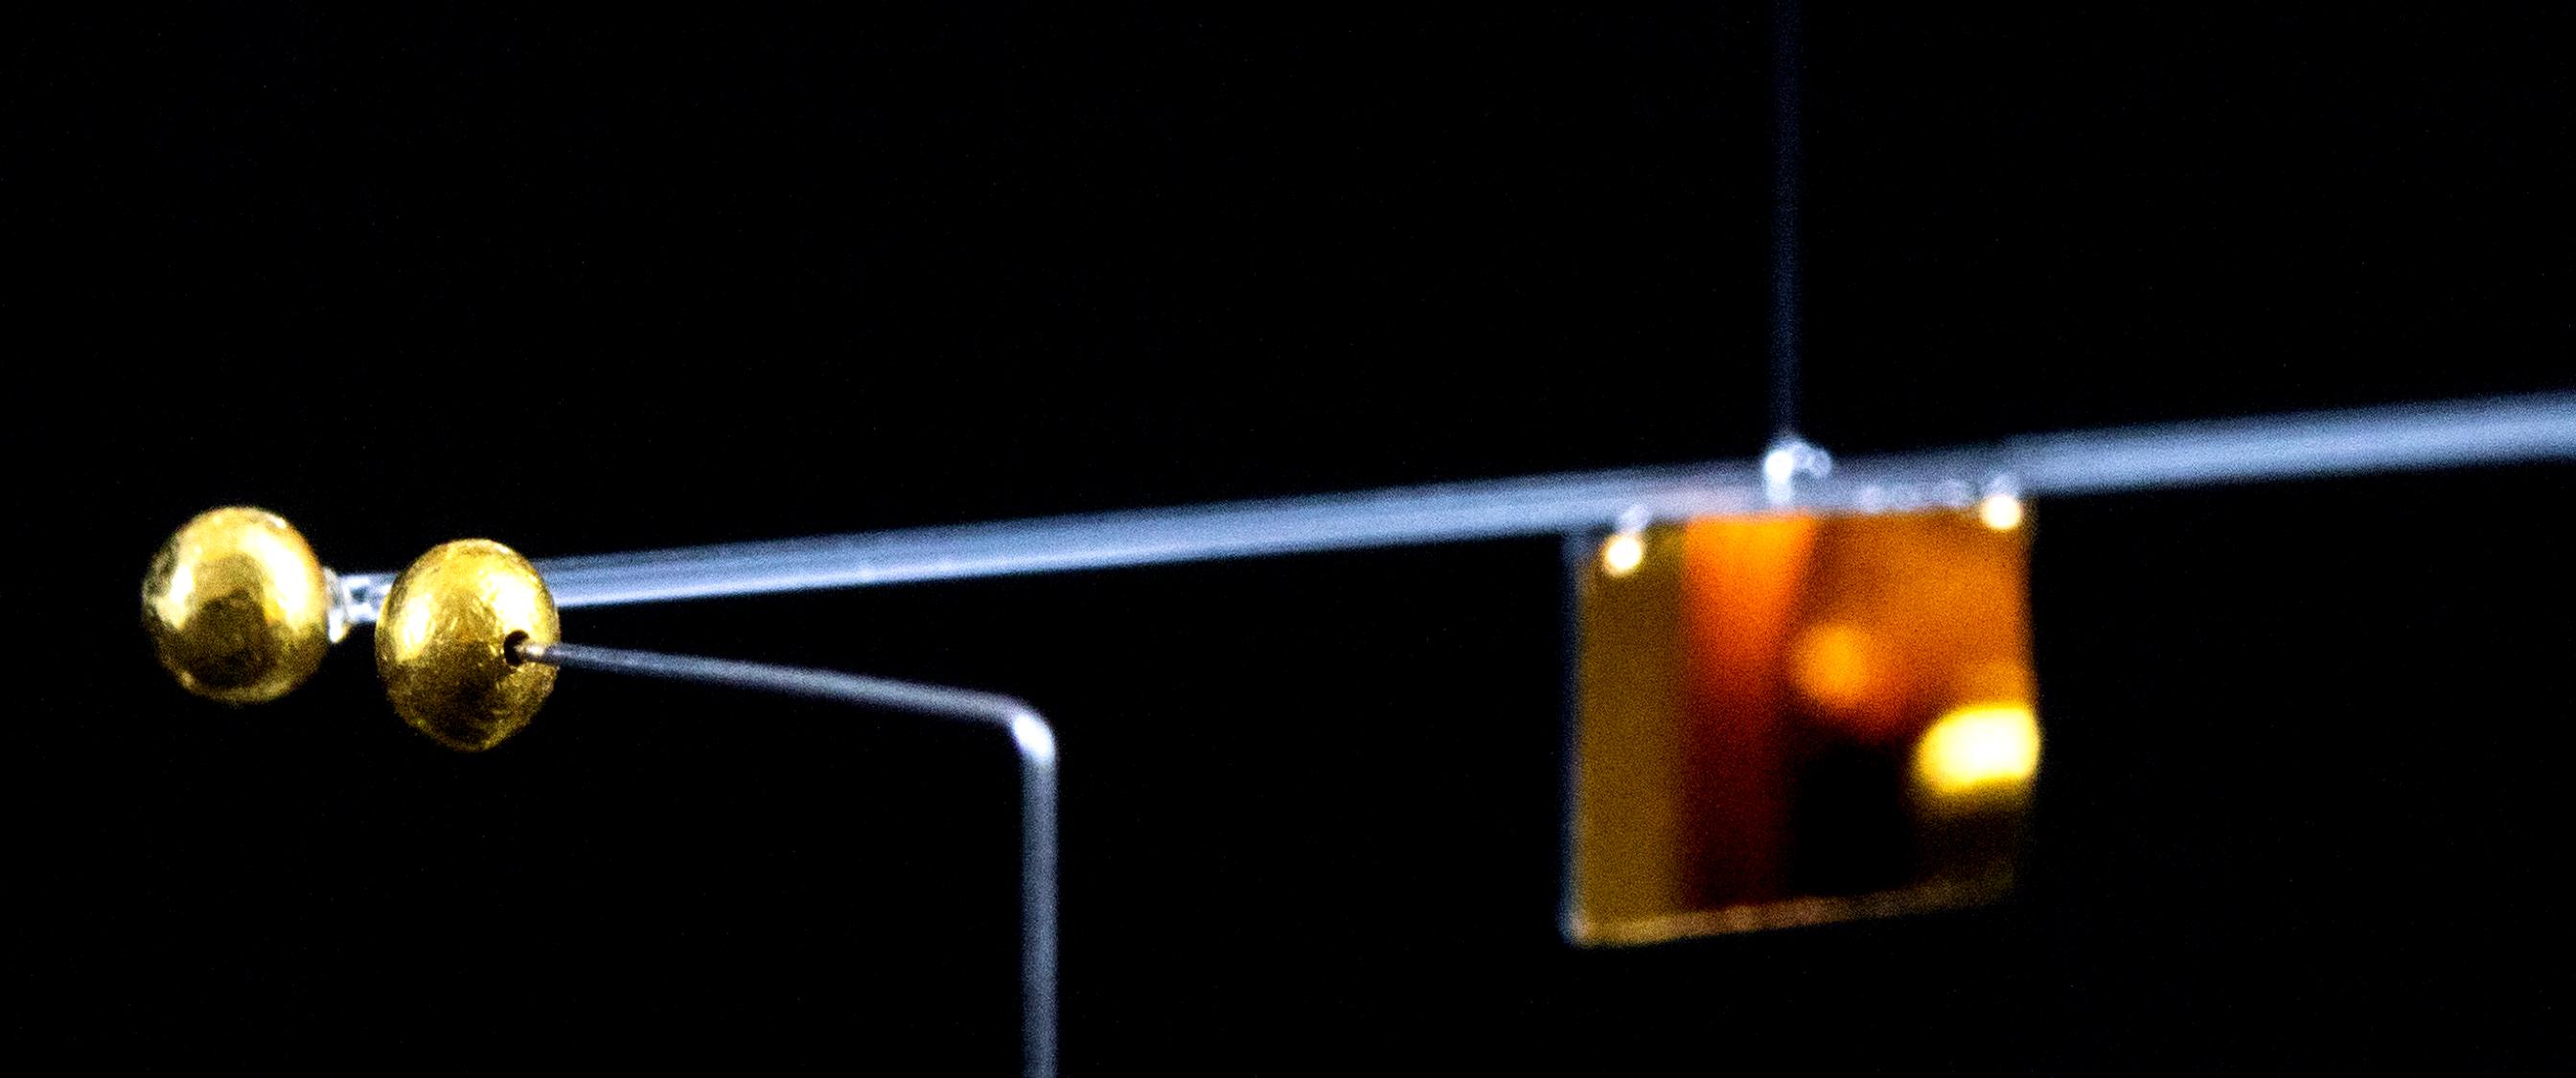 torsional pendulum.jpg